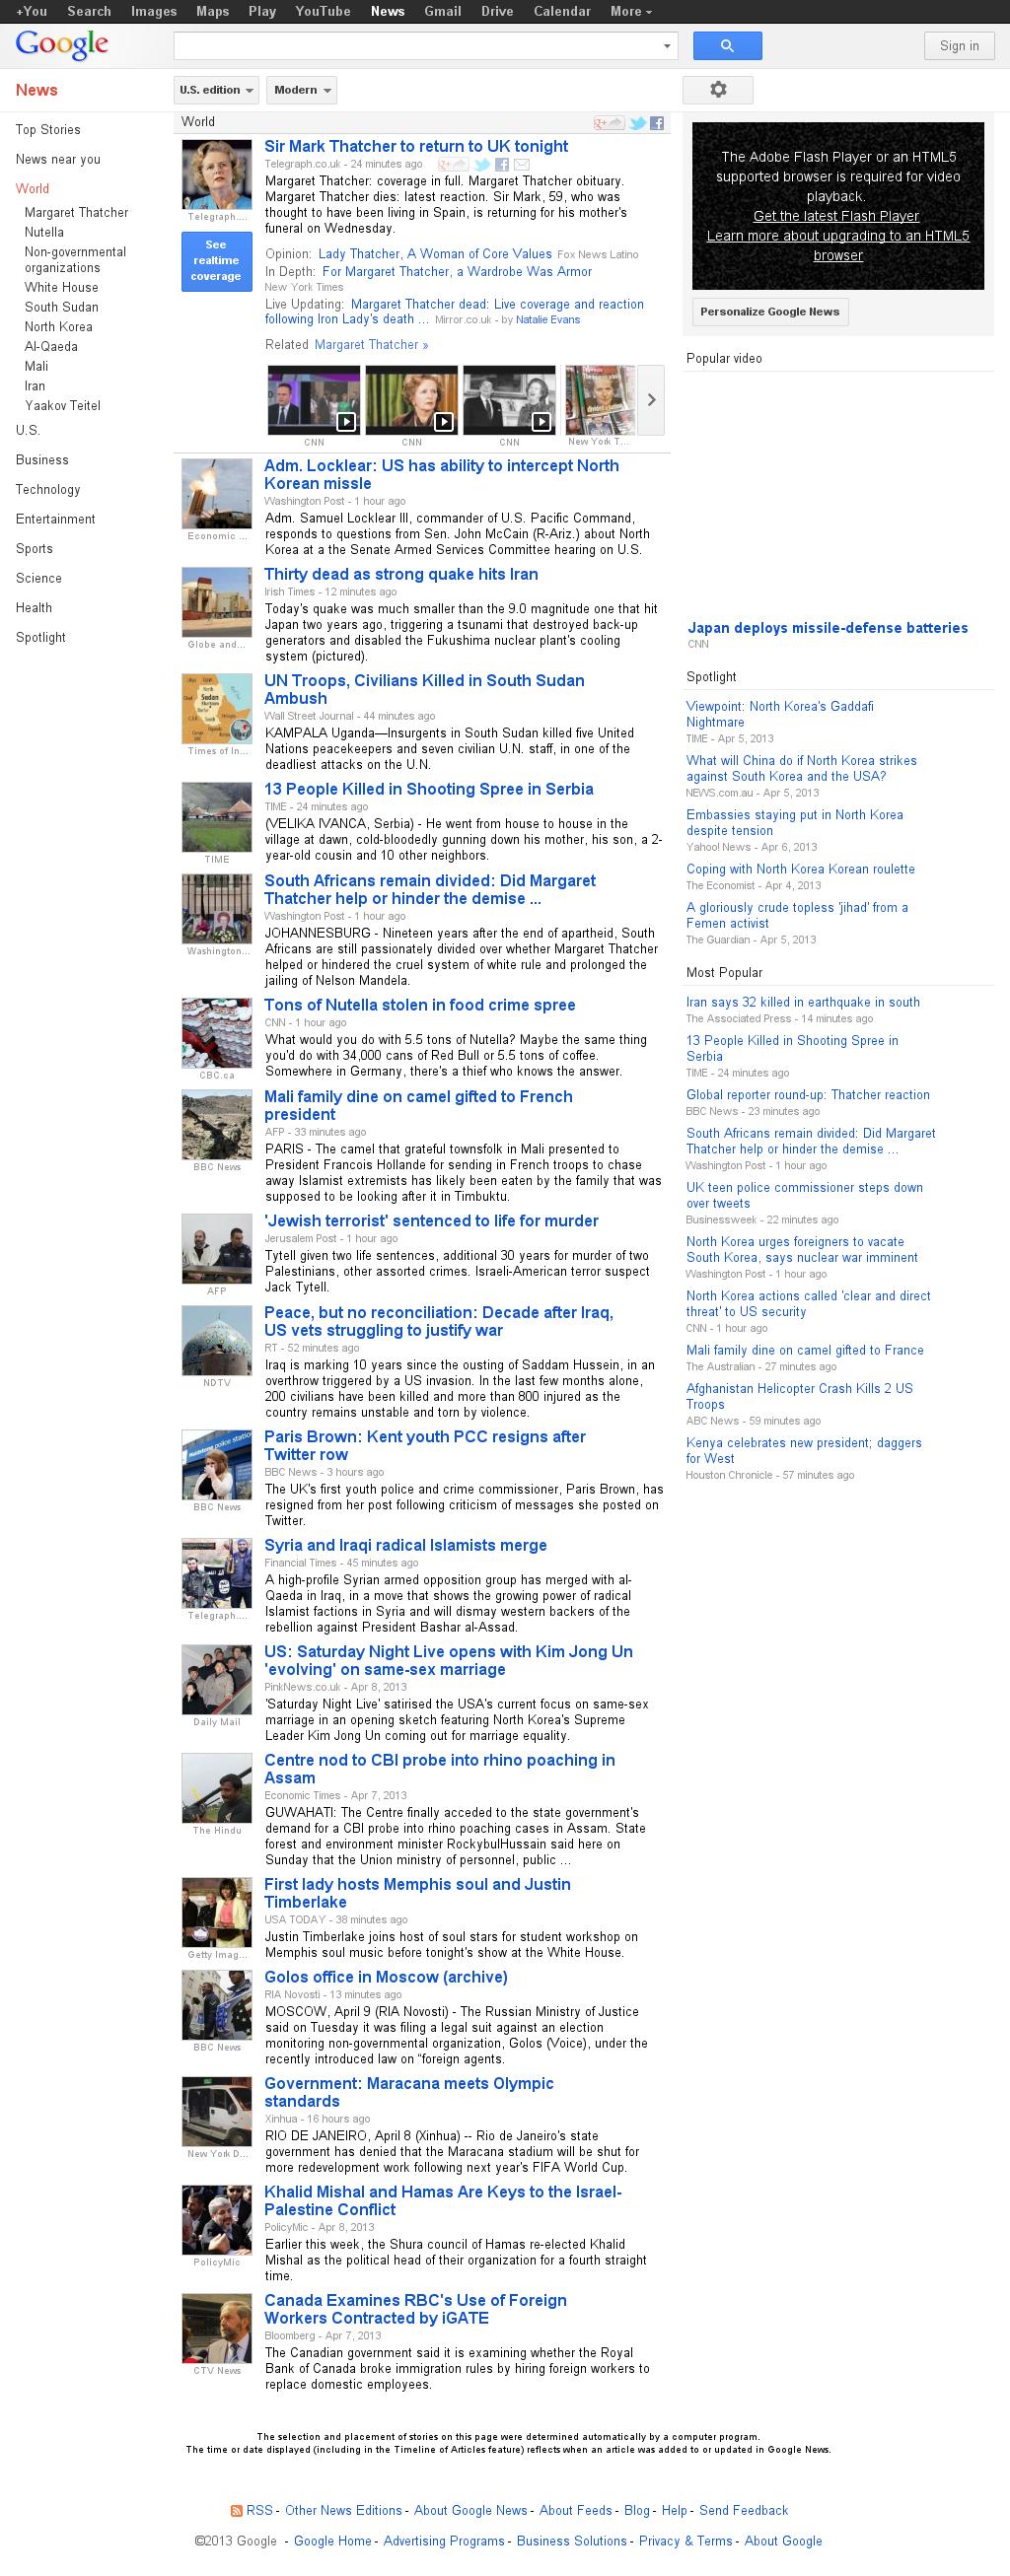 Google News: World at Tuesday April 9, 2013, 6:08 p.m. UTC